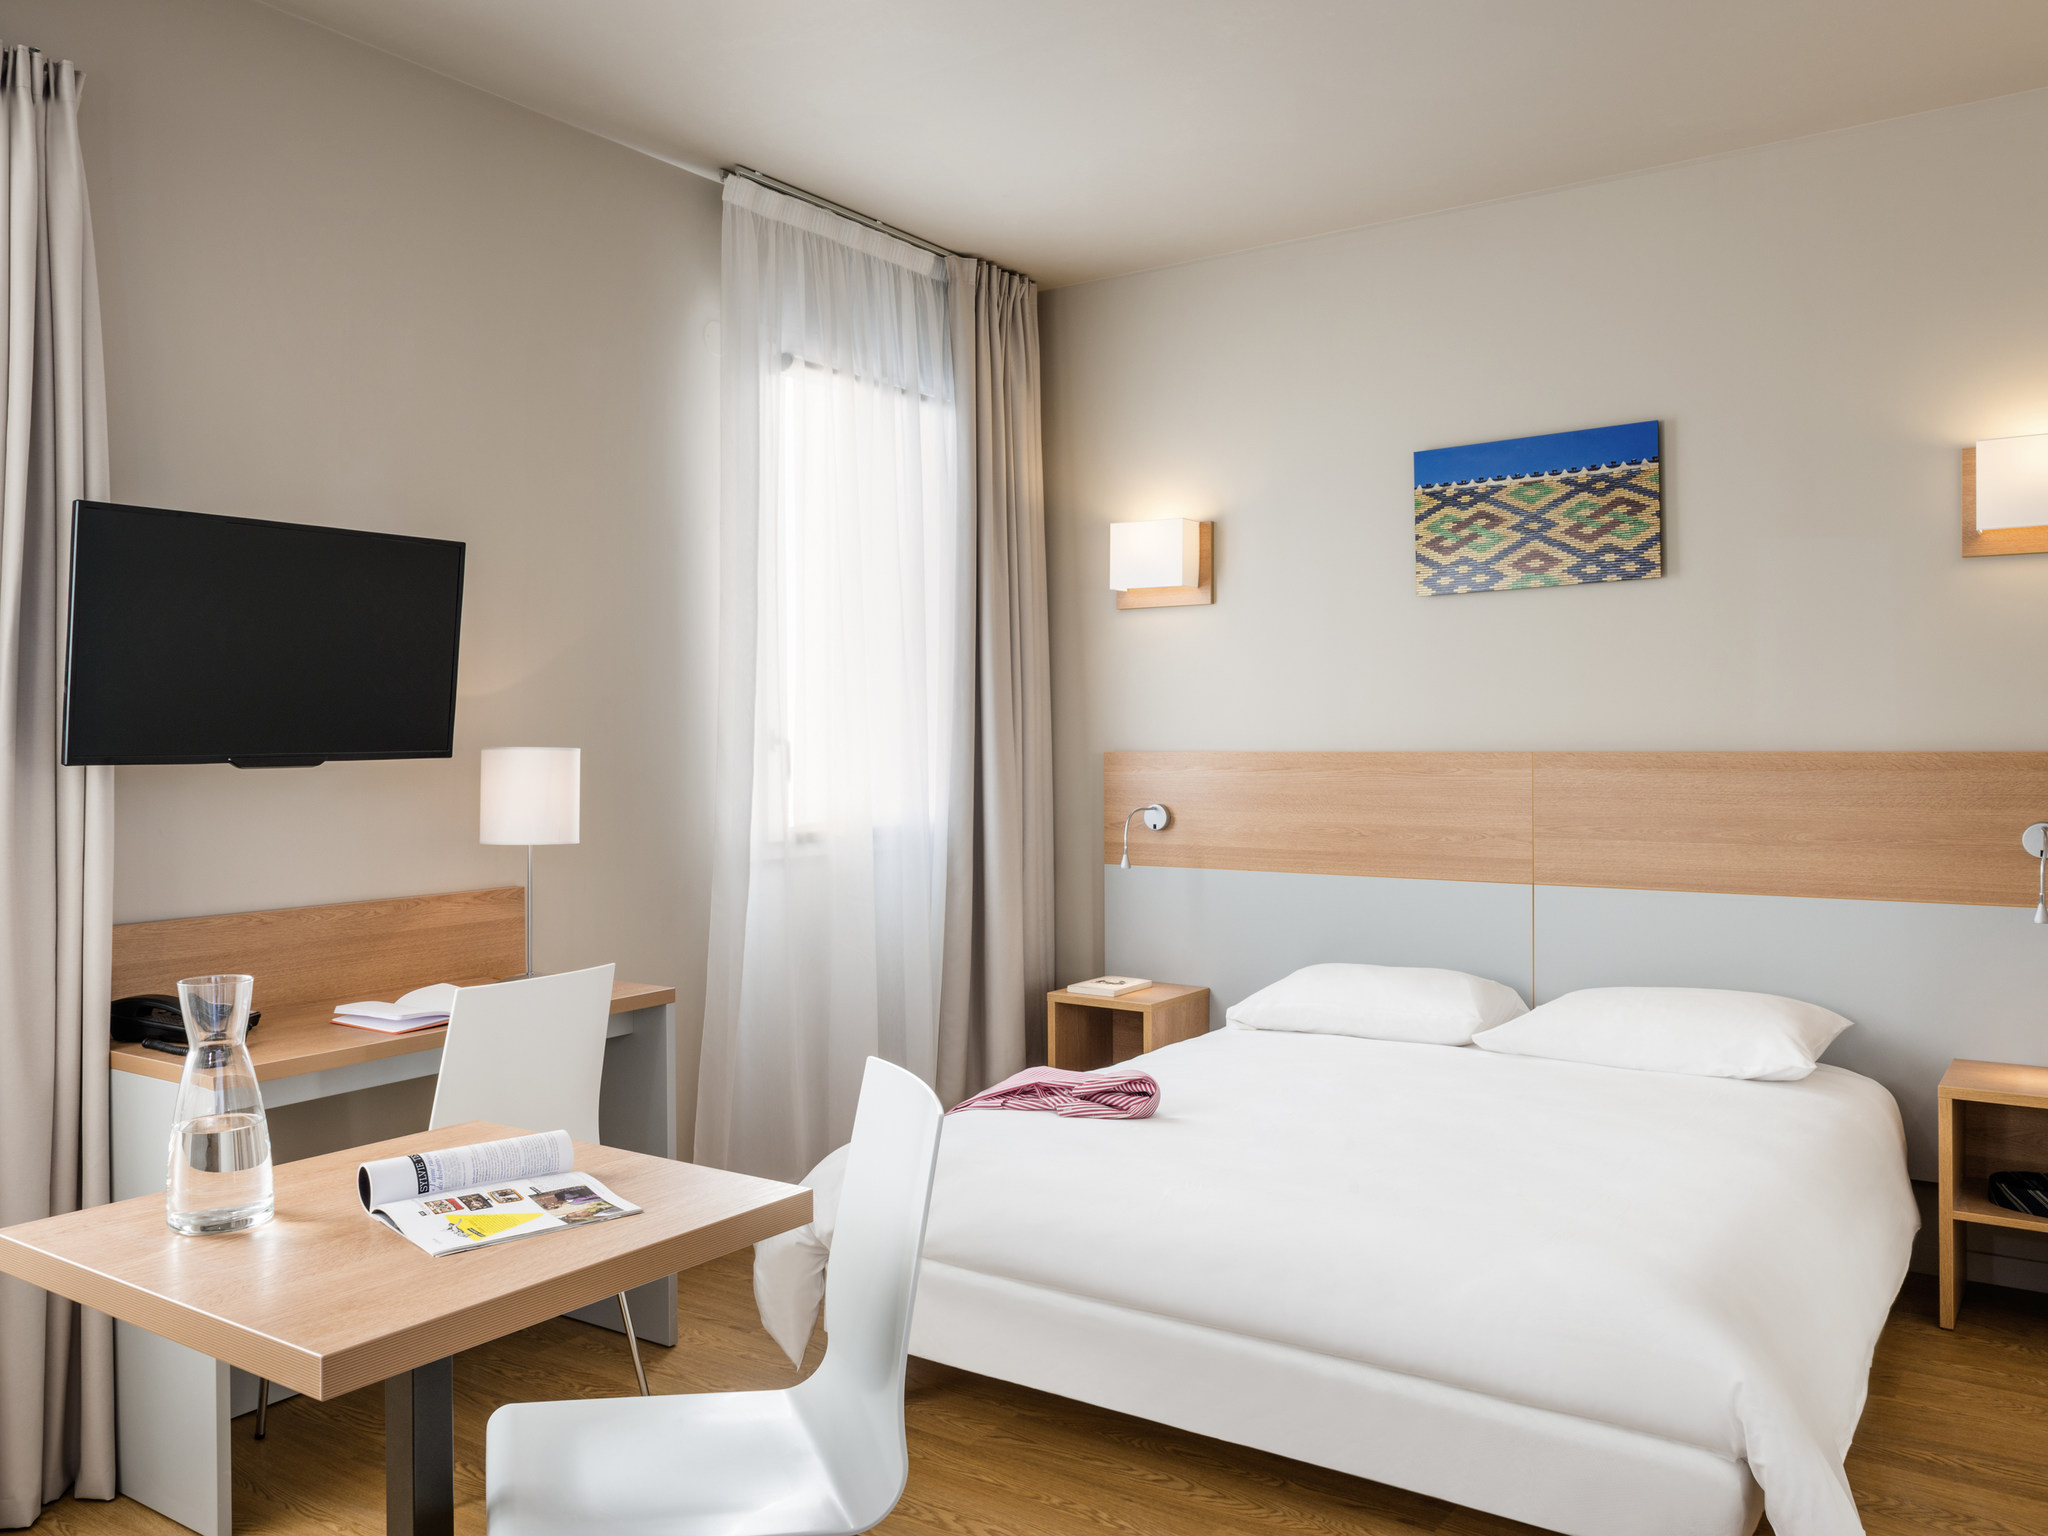 Hotel in dijon aparthotel adagio access dijon r publique for Hotels dijon